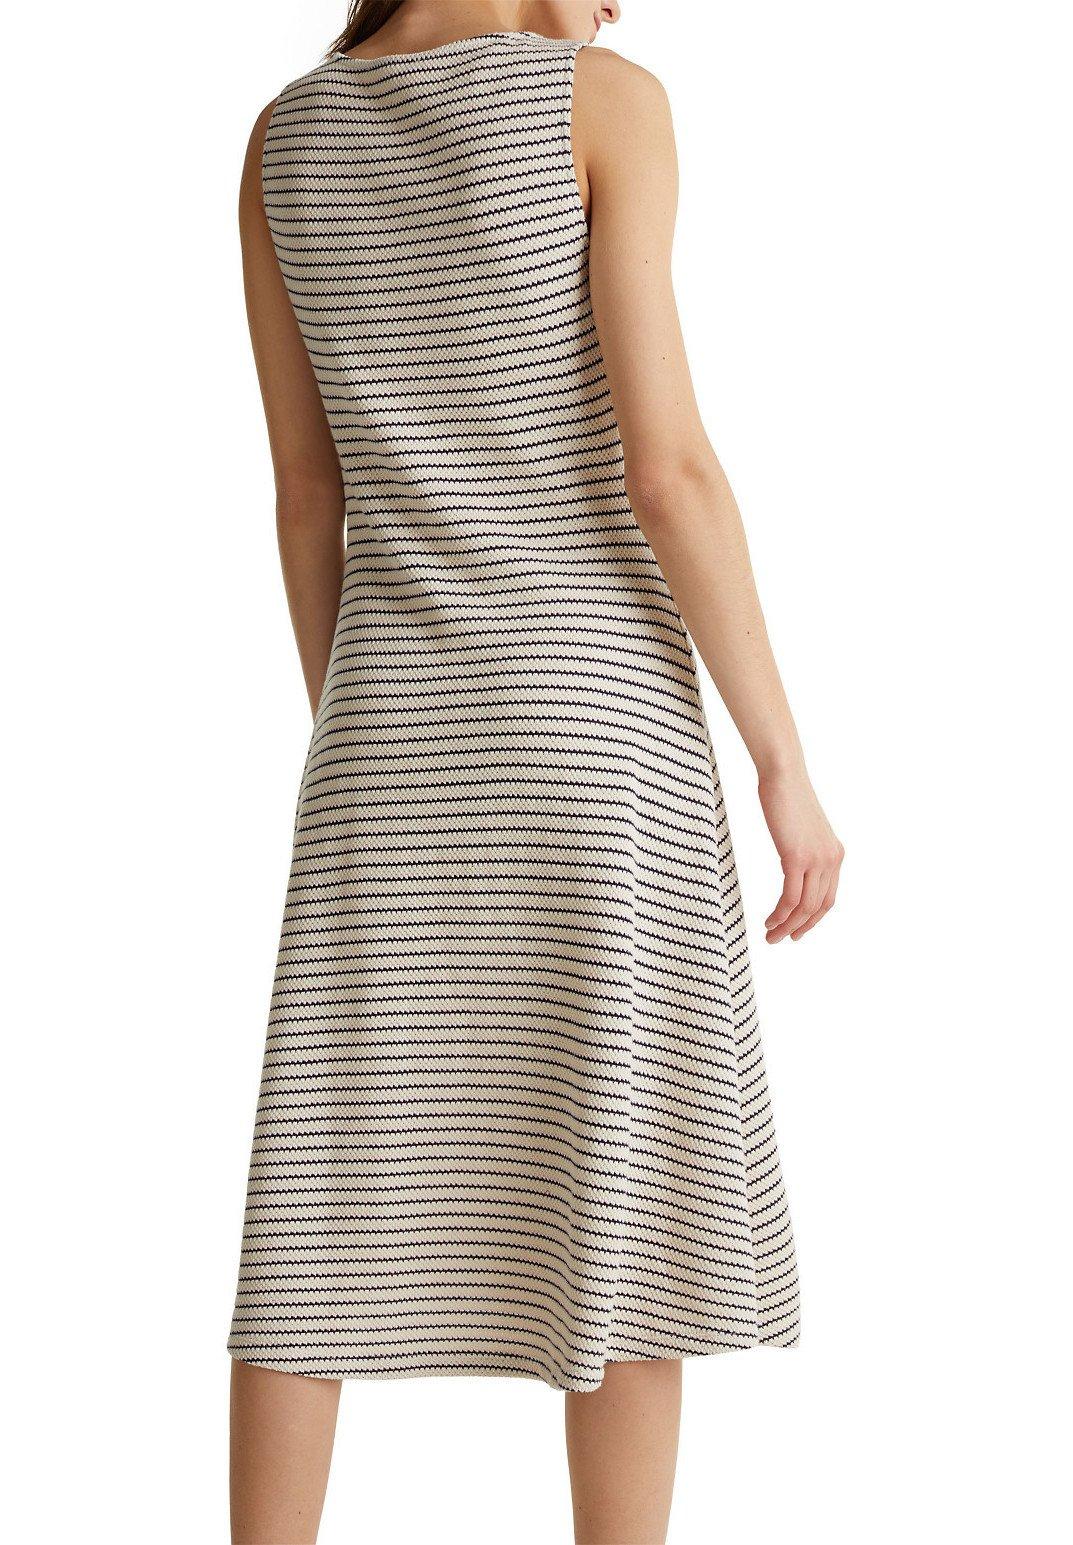 Esprit STRIPES DRESS - Robe pull - sand - Robes femme DZMN6